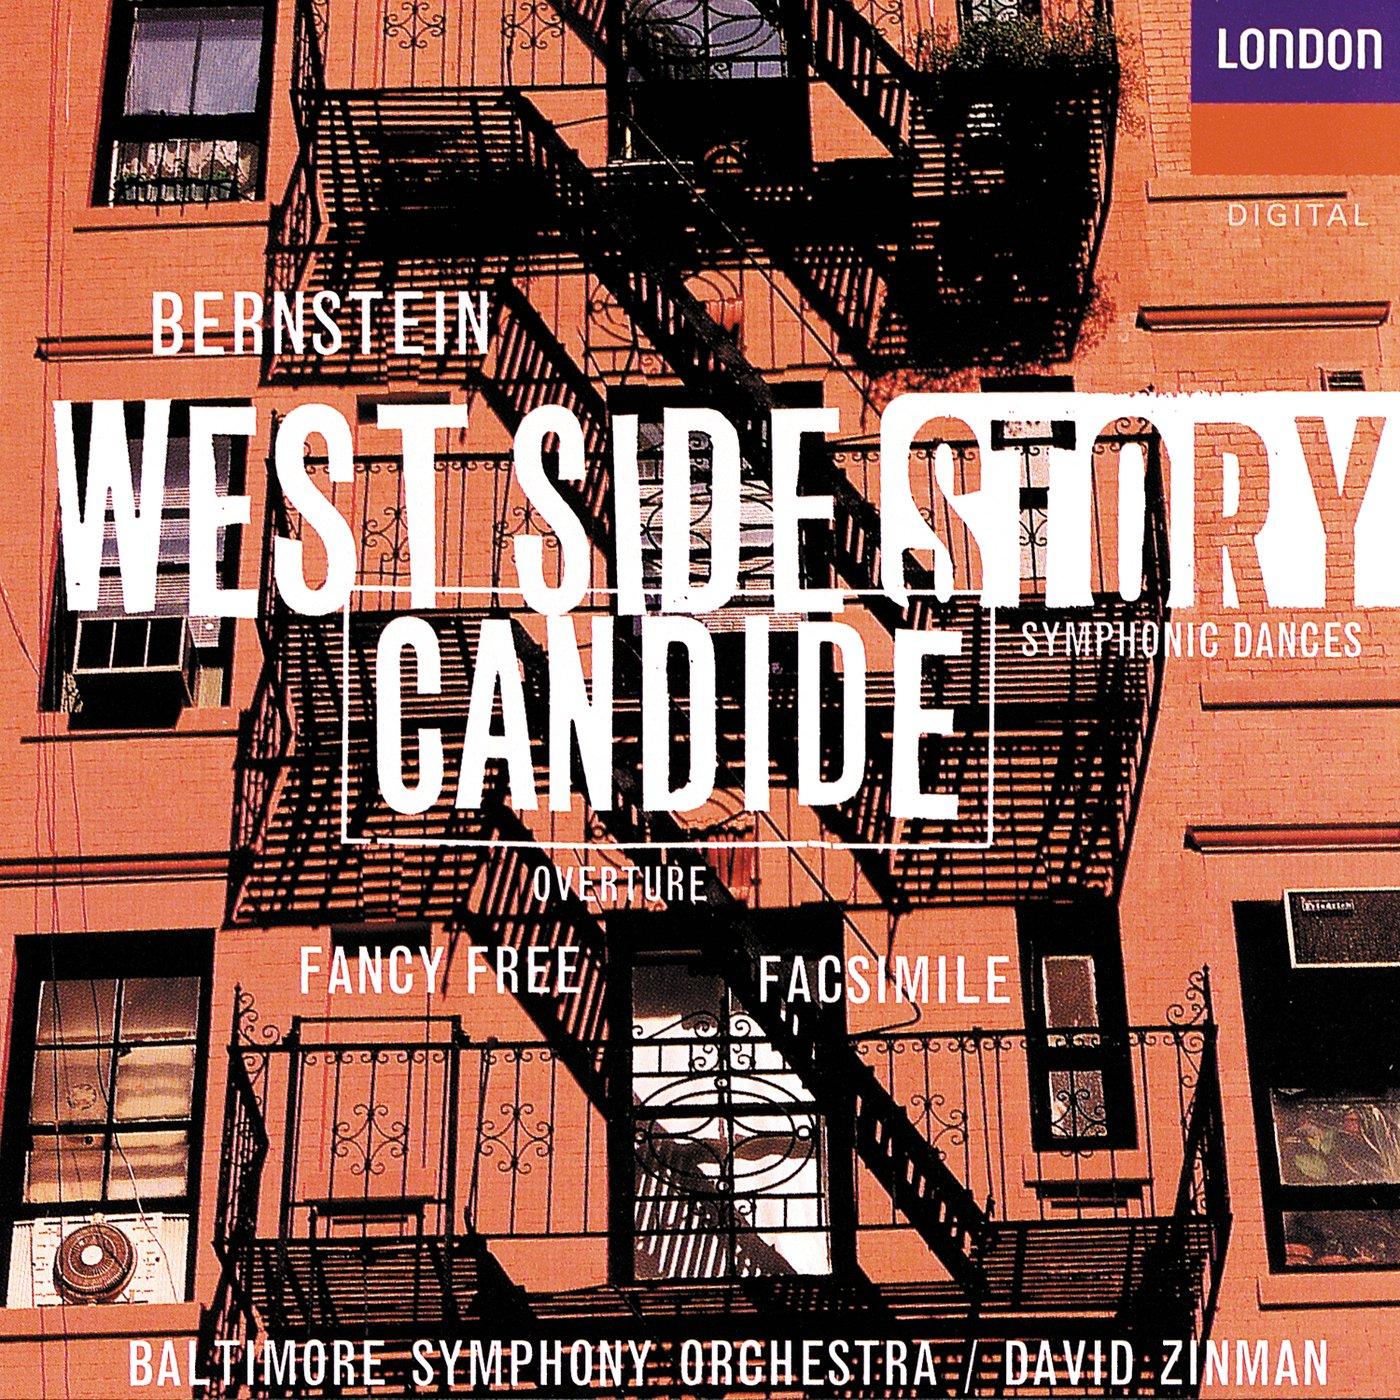 West Side Story / Candide Ov / Fancy Free